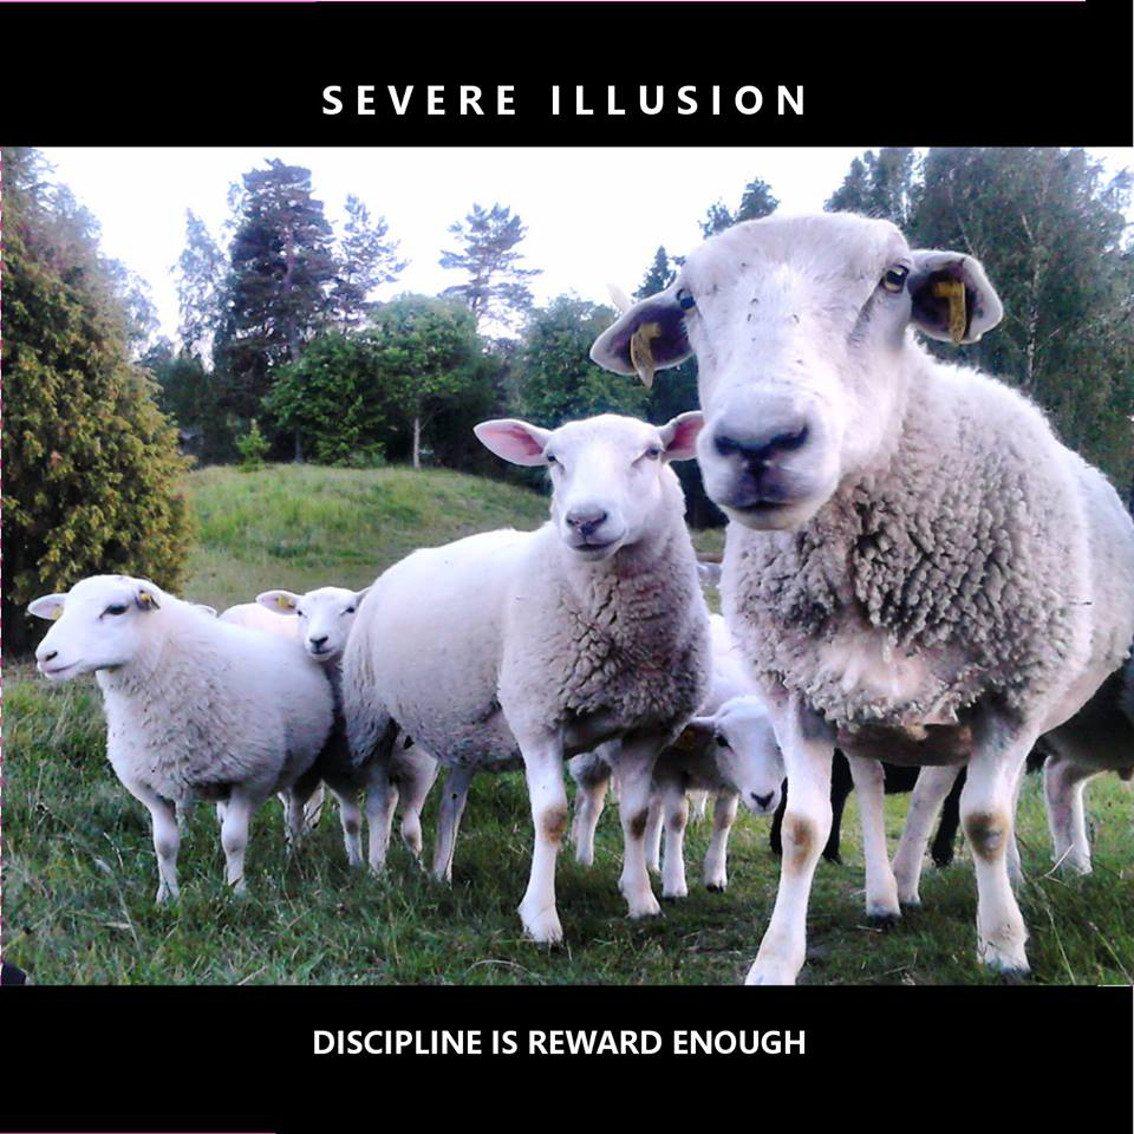 Severe Illusion has 2003 album 'Discipline Is Reward Enough' re-released as 2cd set